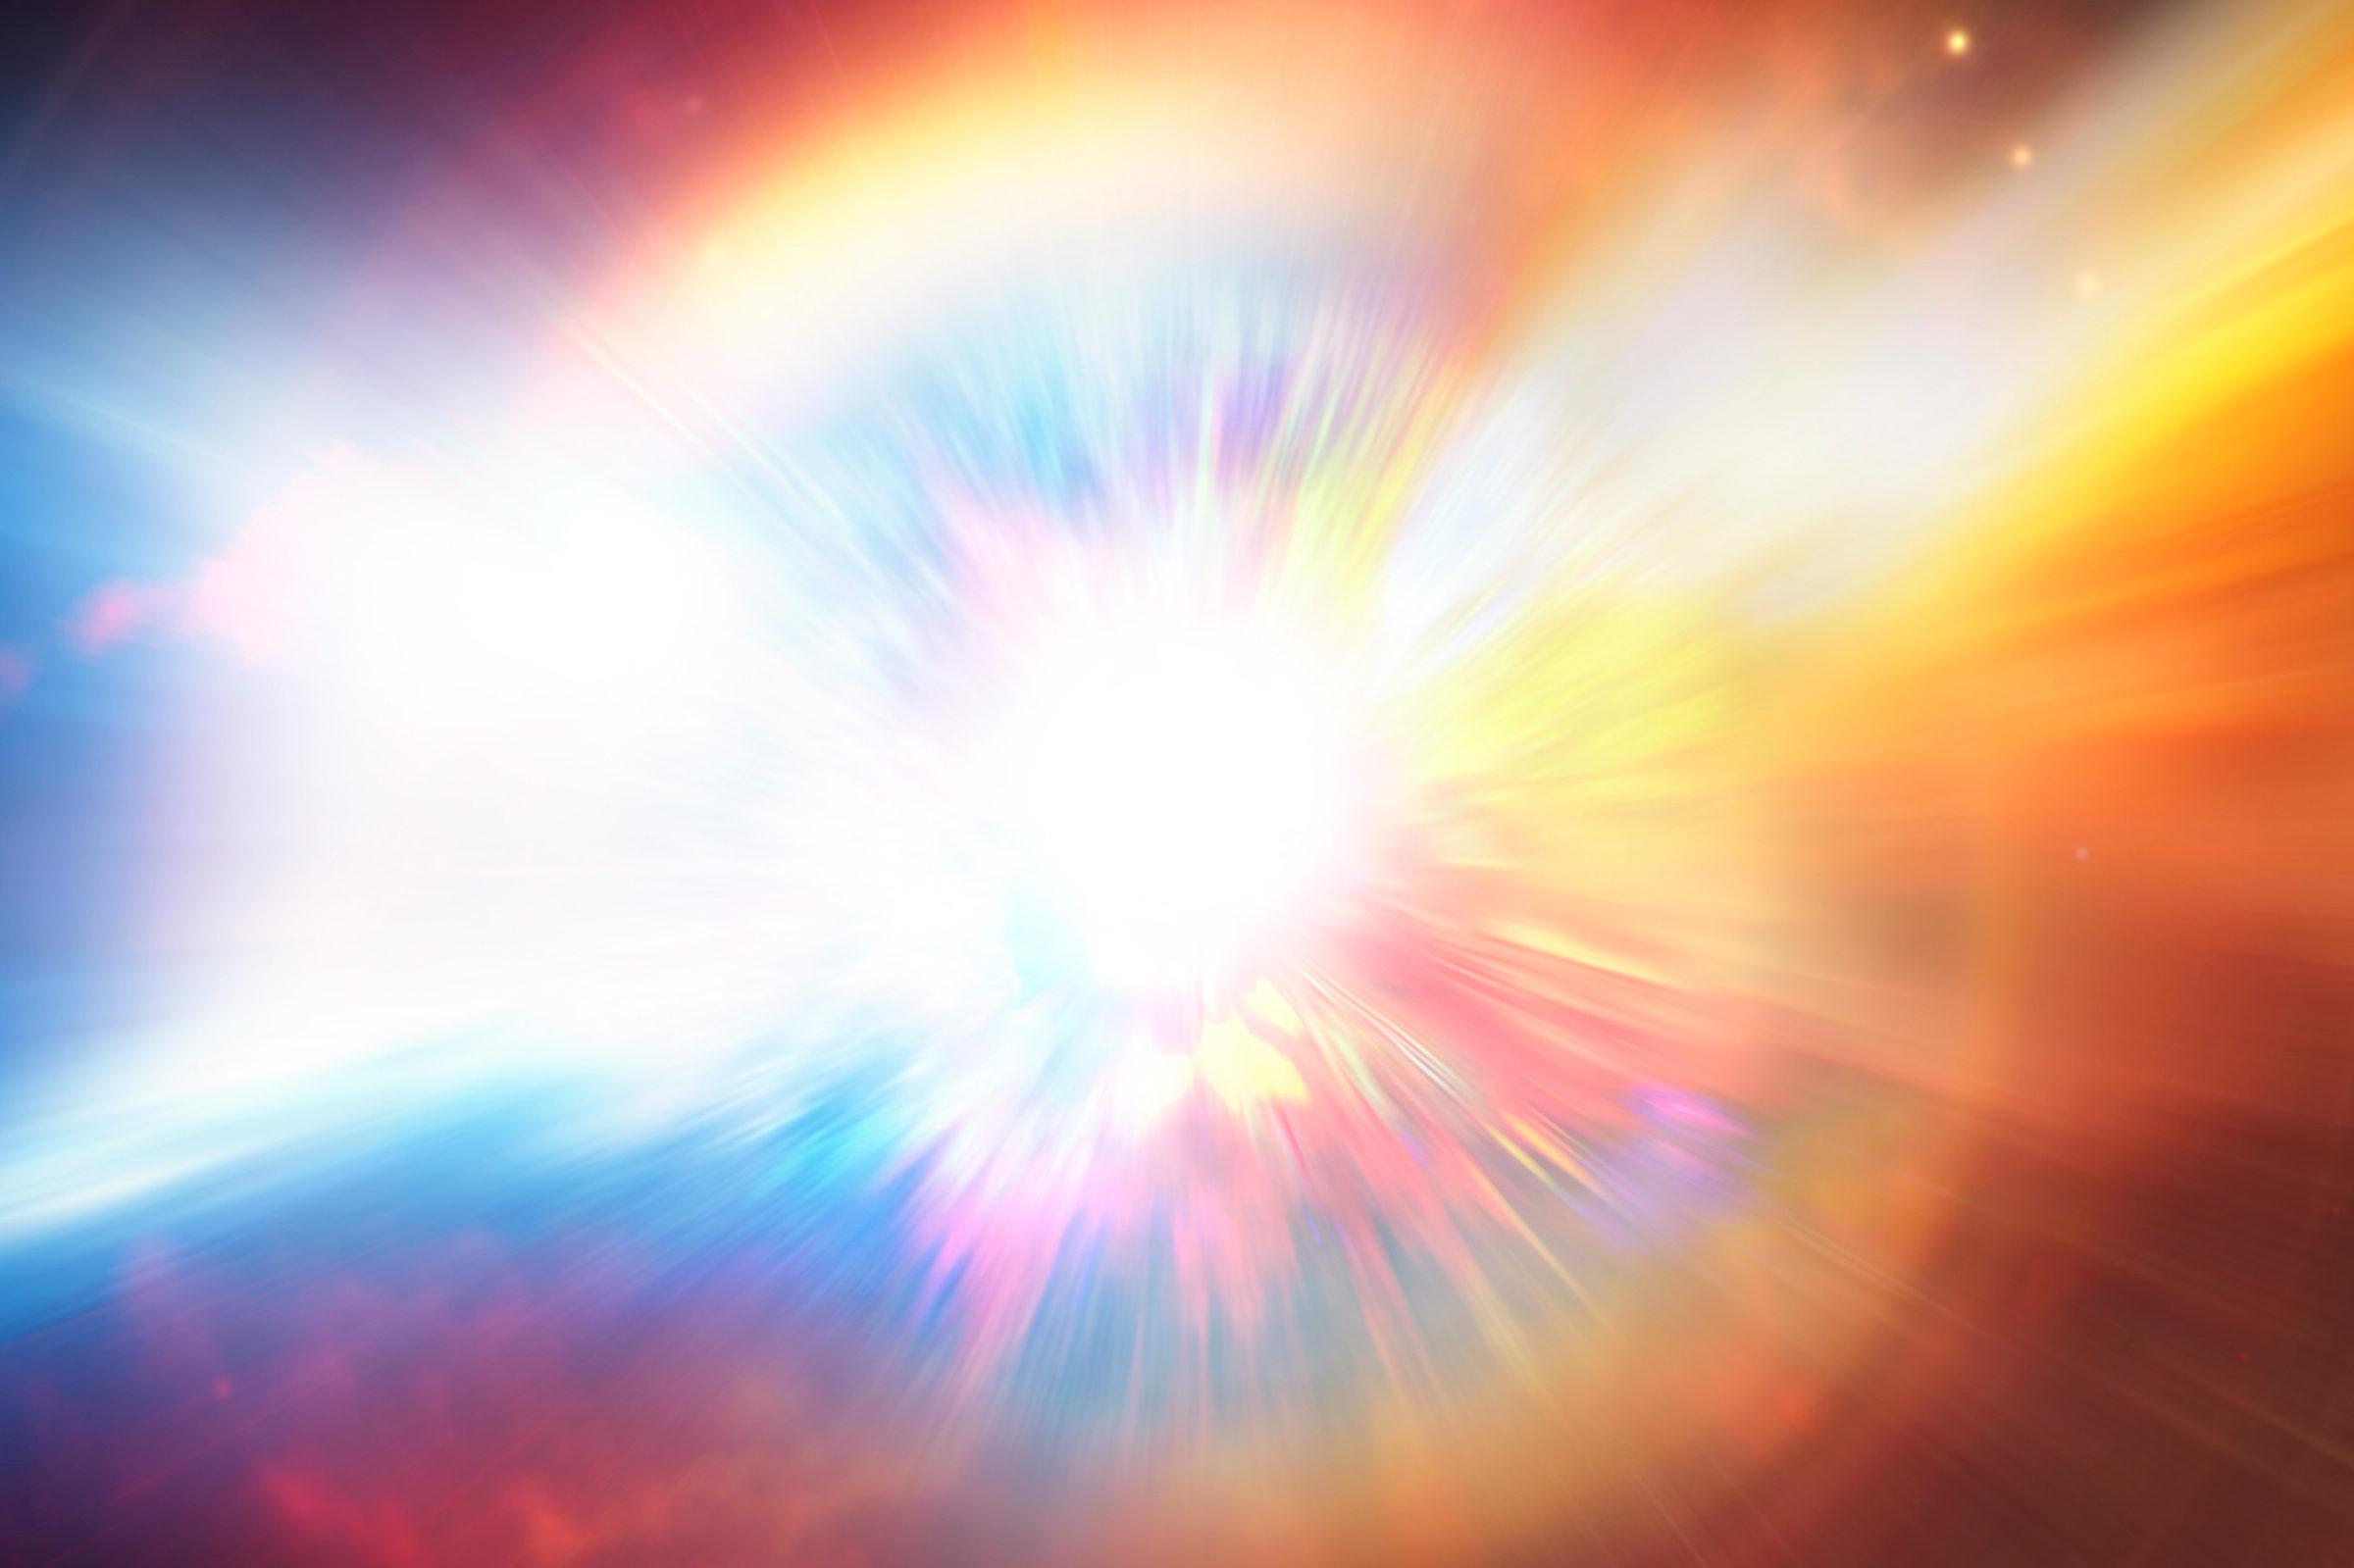 Digital illustration of an exploding star